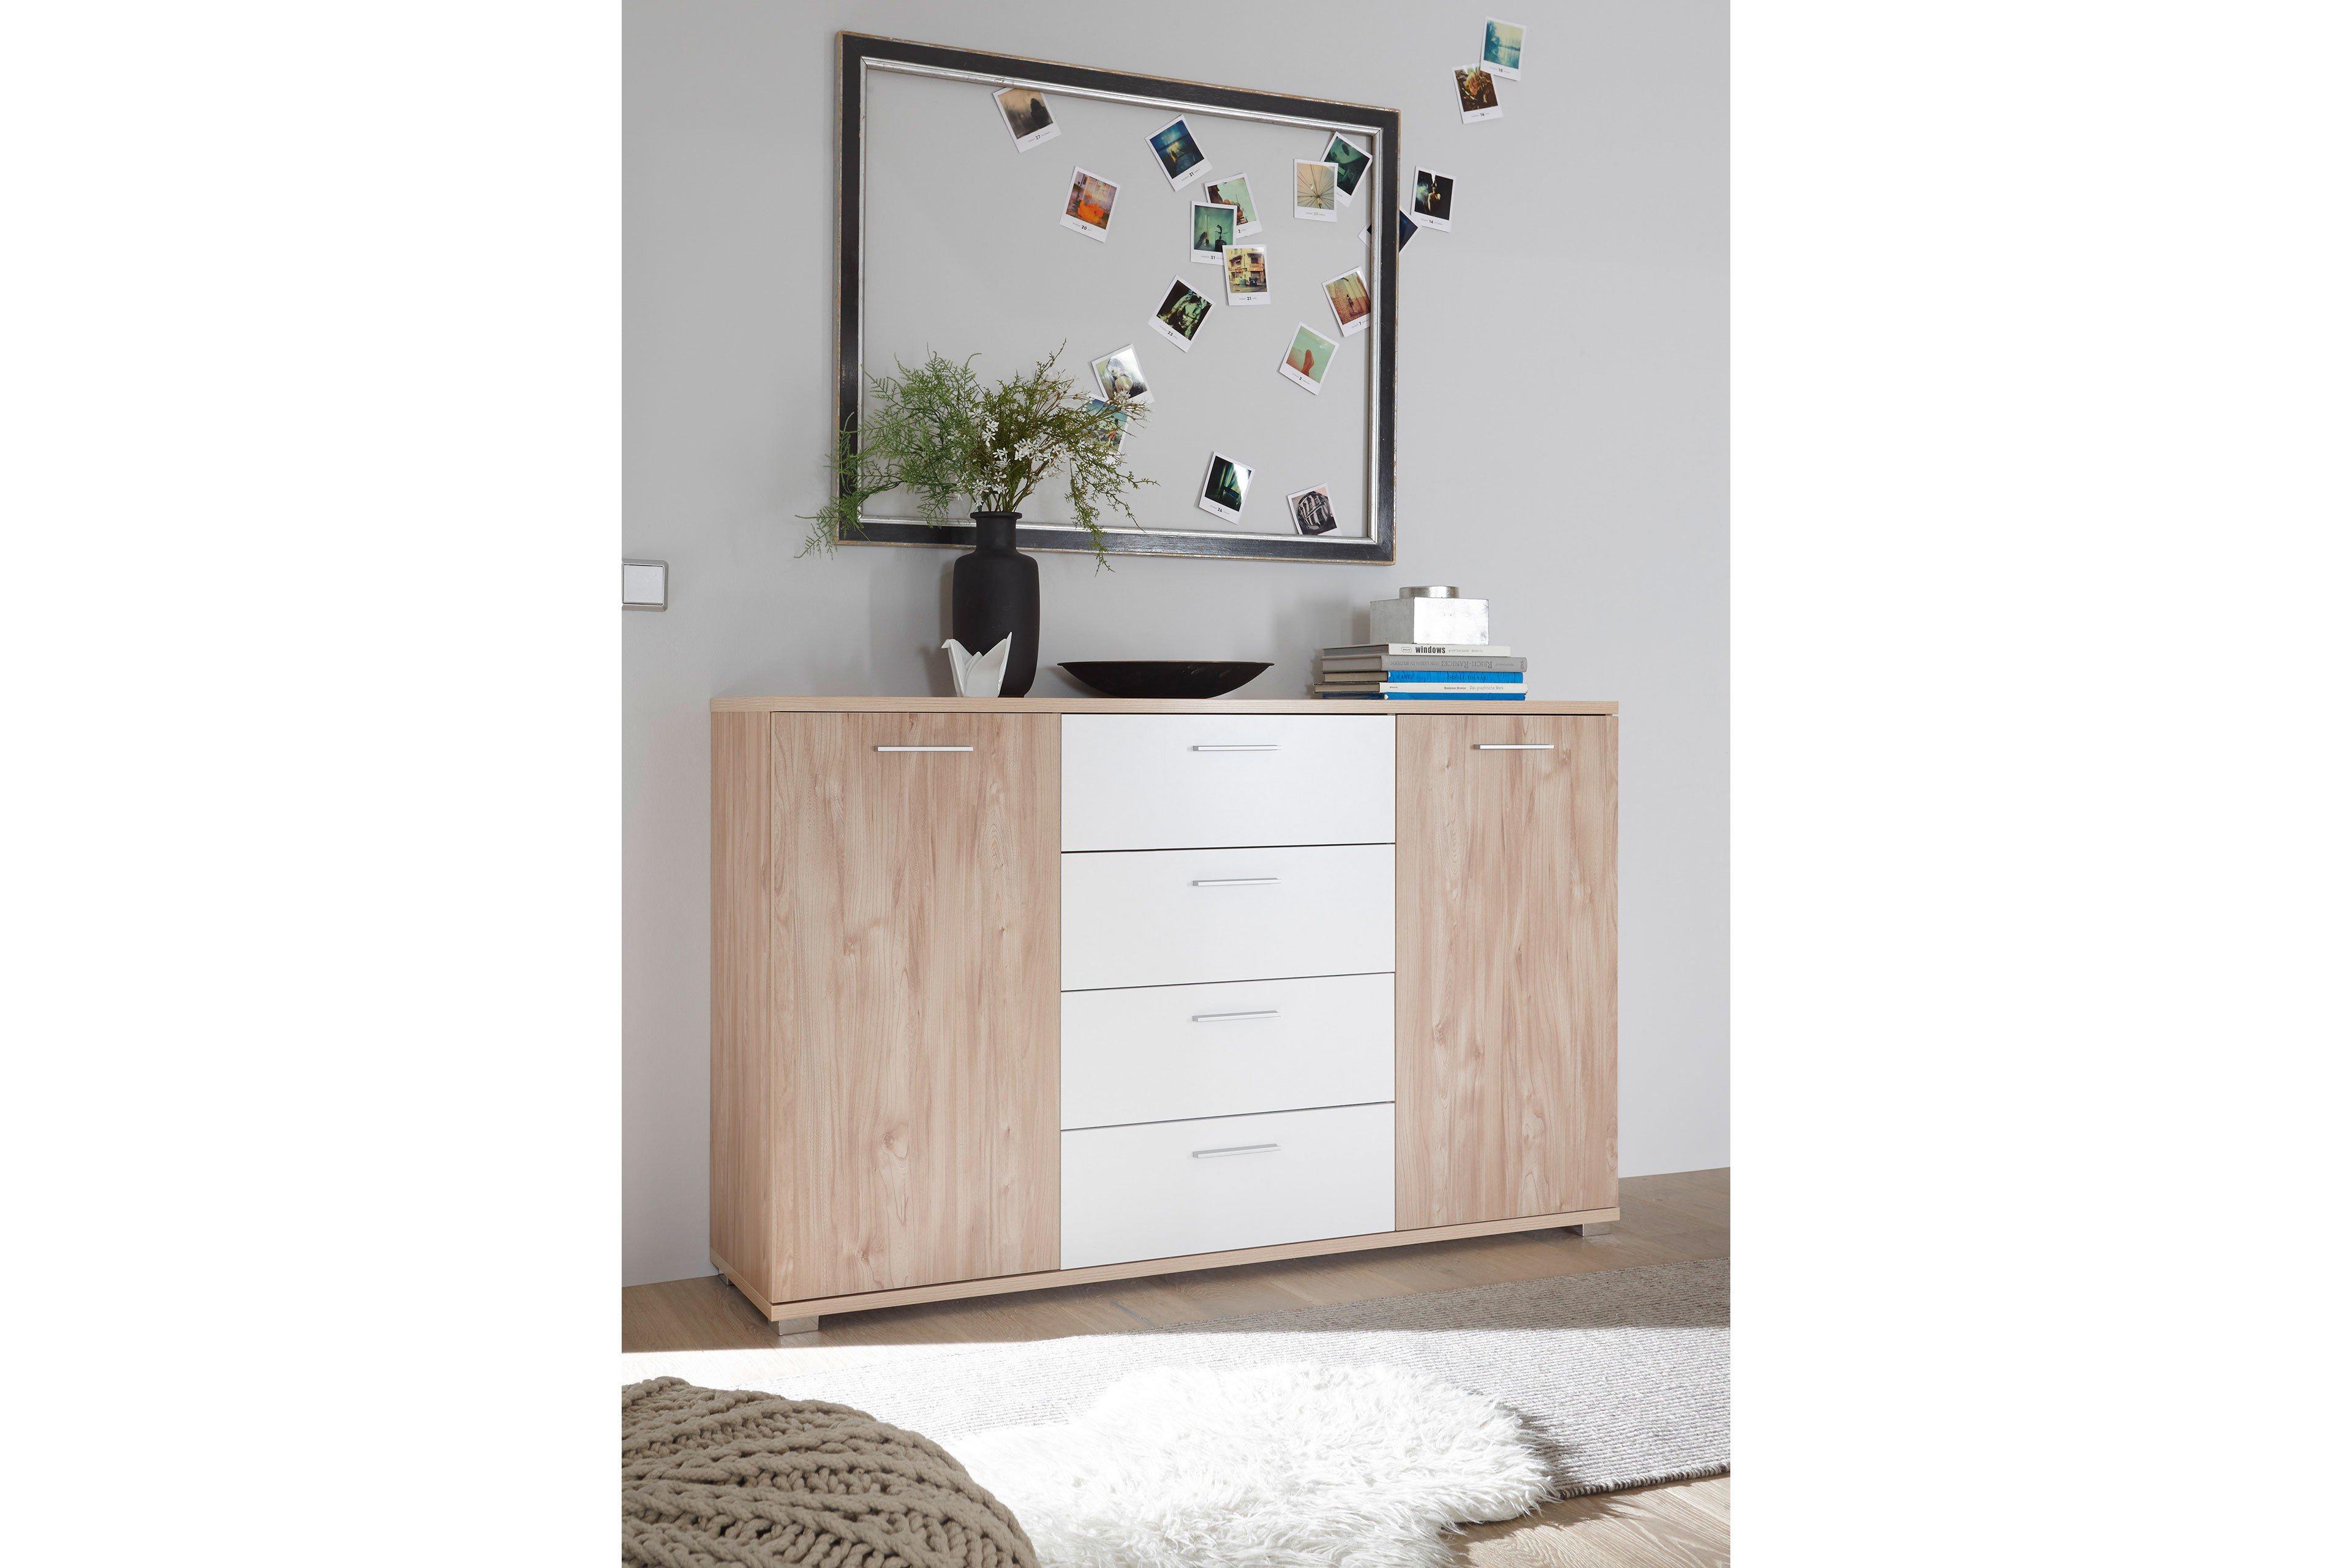 schlafkontor malibu kommode wei glas kara m bel letz ihr online shop. Black Bedroom Furniture Sets. Home Design Ideas